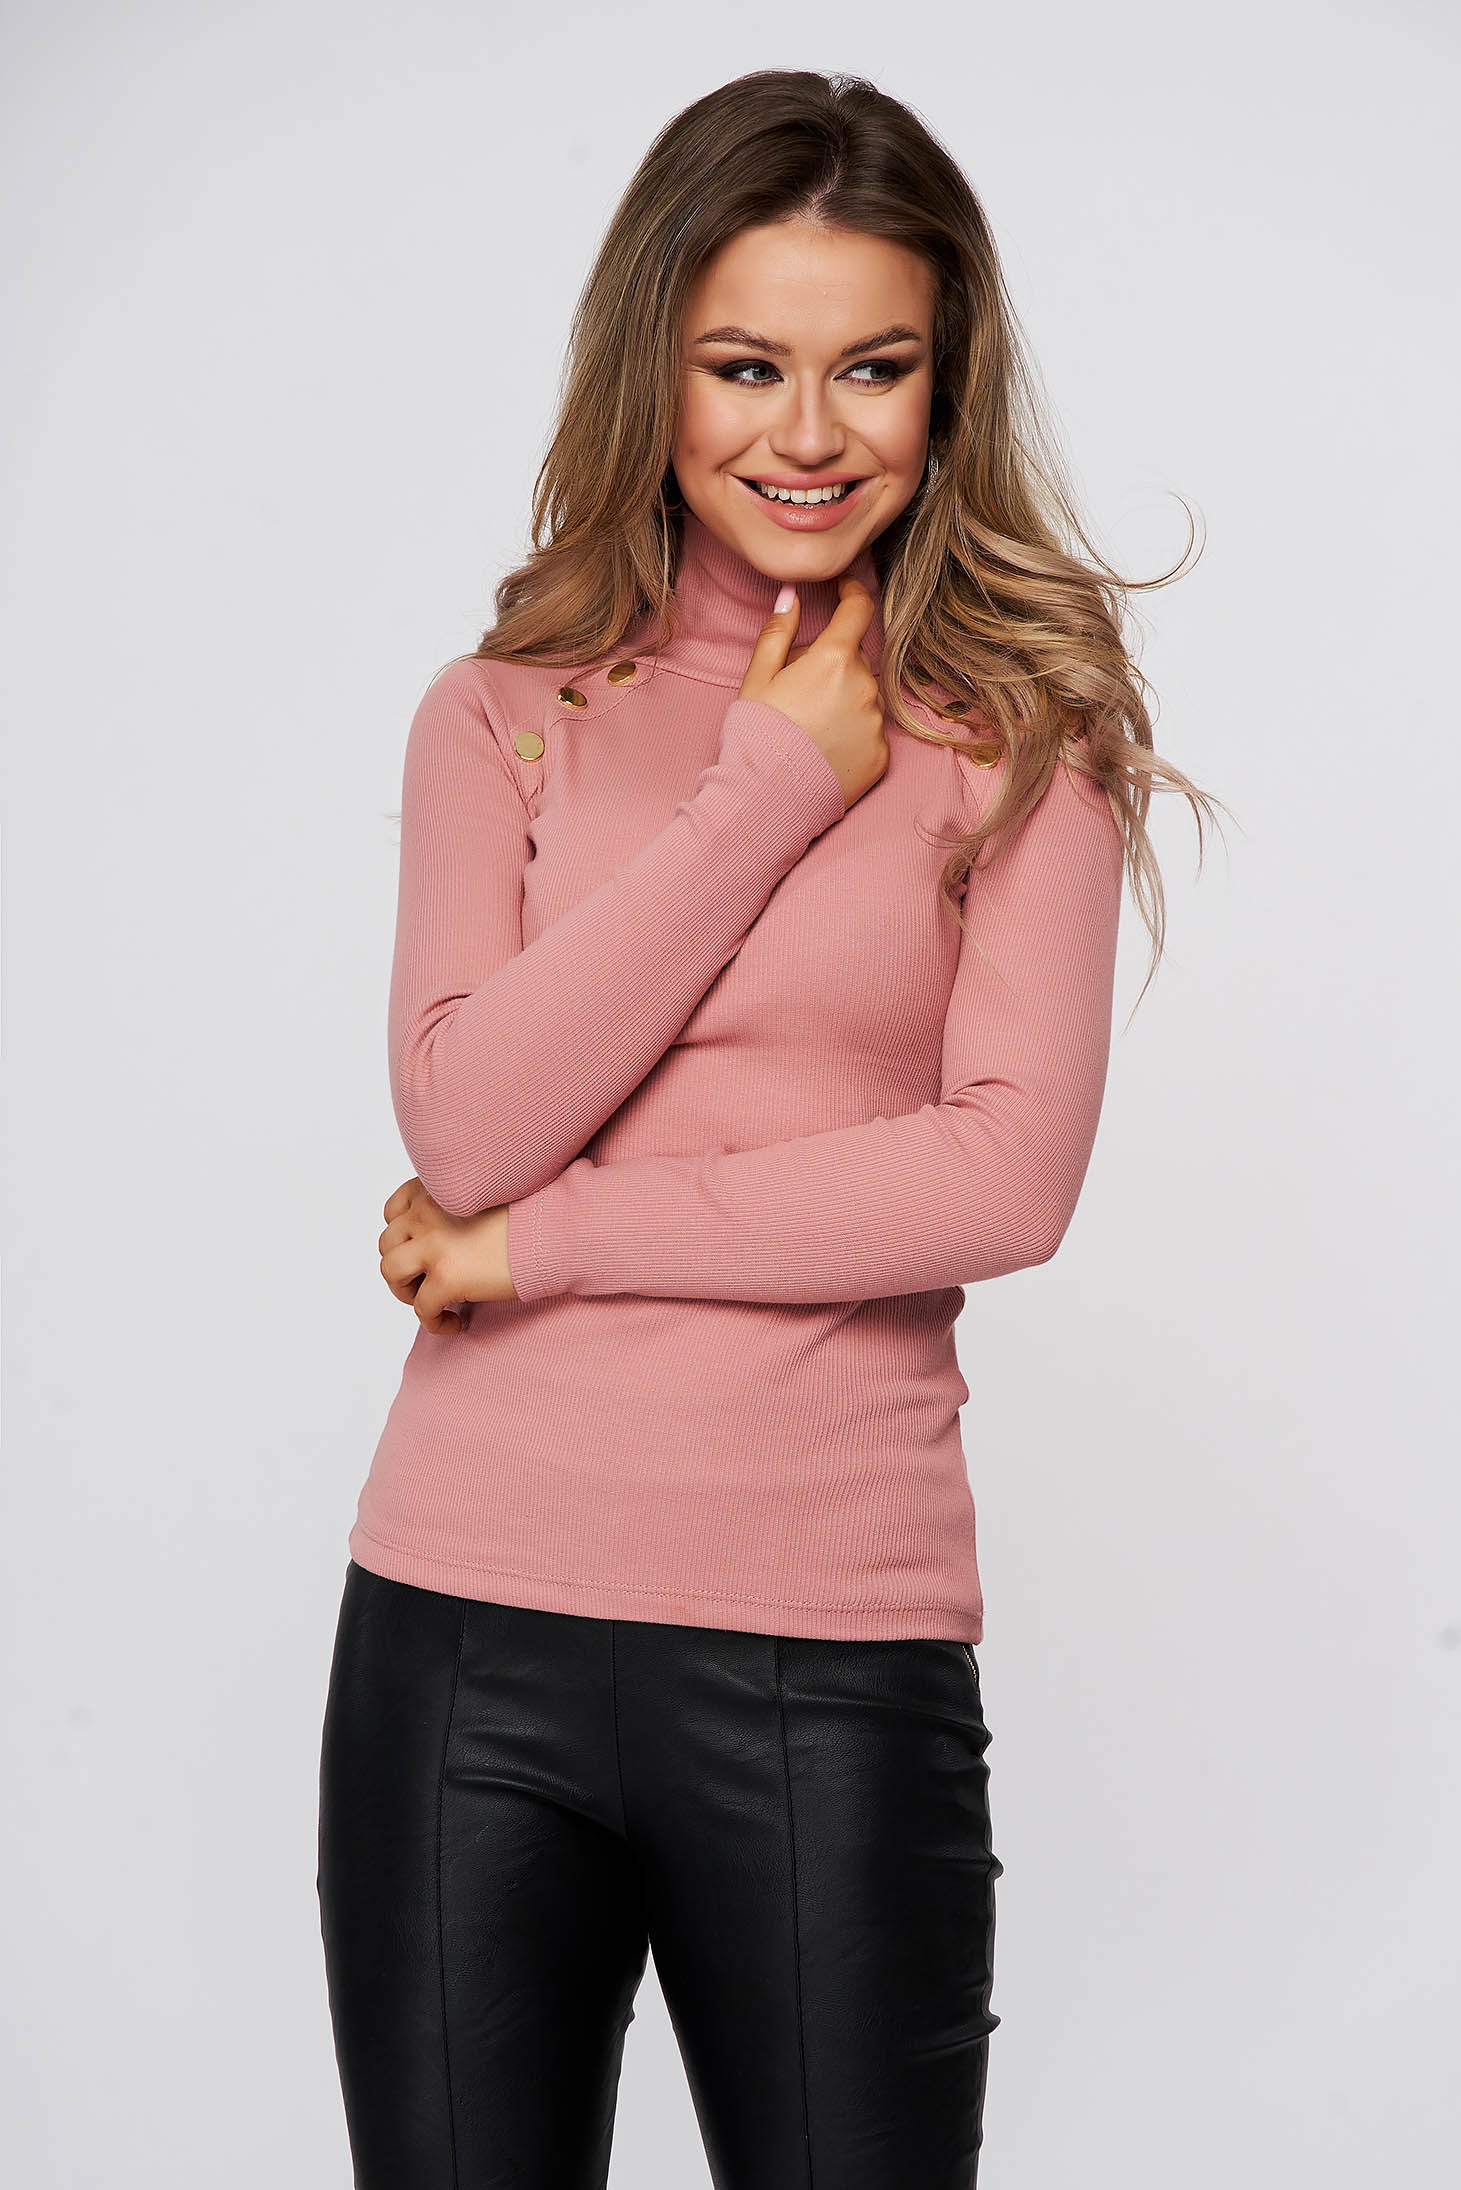 Bluza dama SunShine roz prafuit mulata din bumbac reiat pe gat